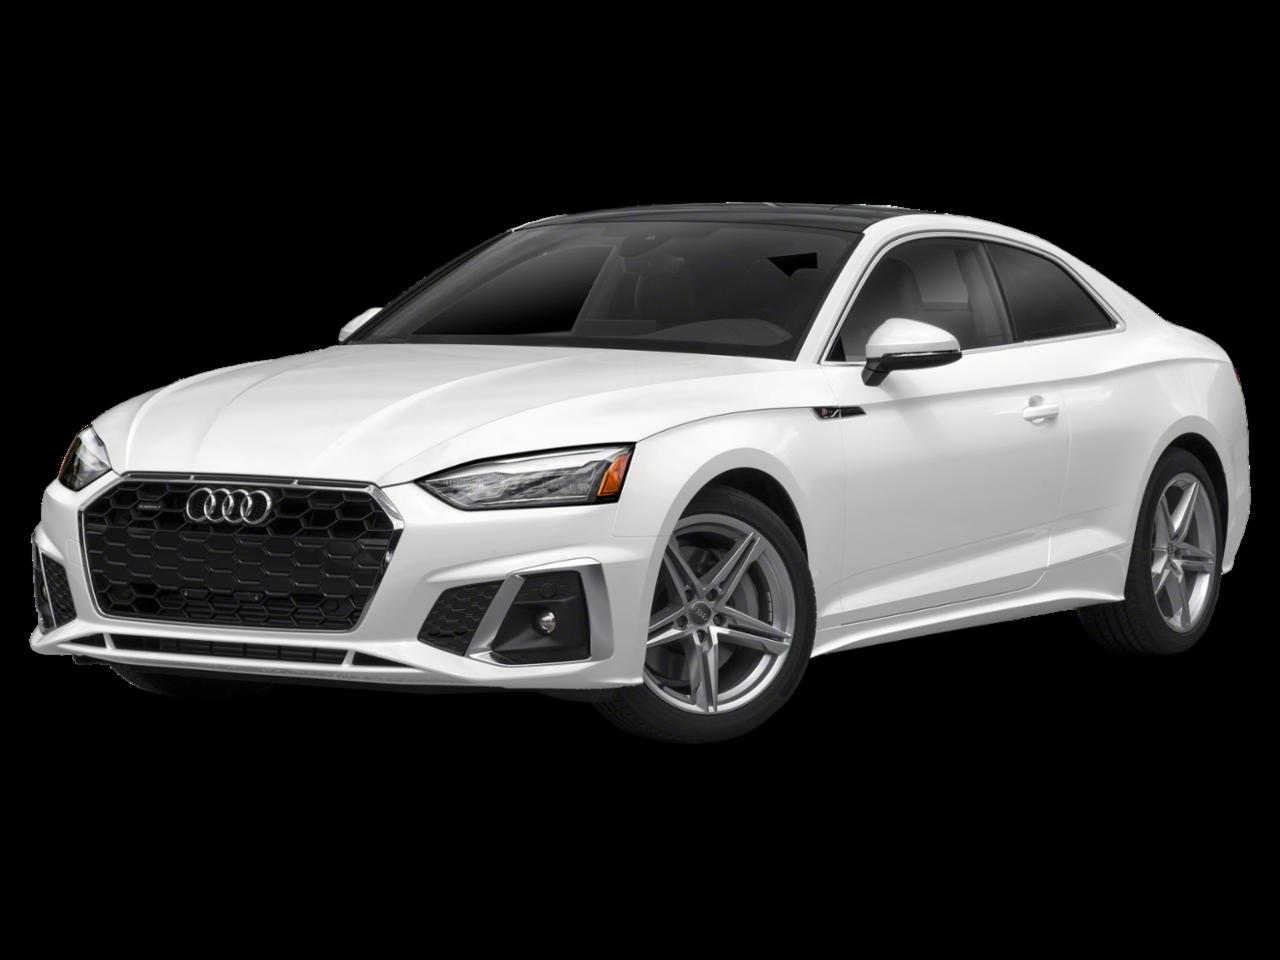 Audi 2021 A5 Coupe S line Premium Plus